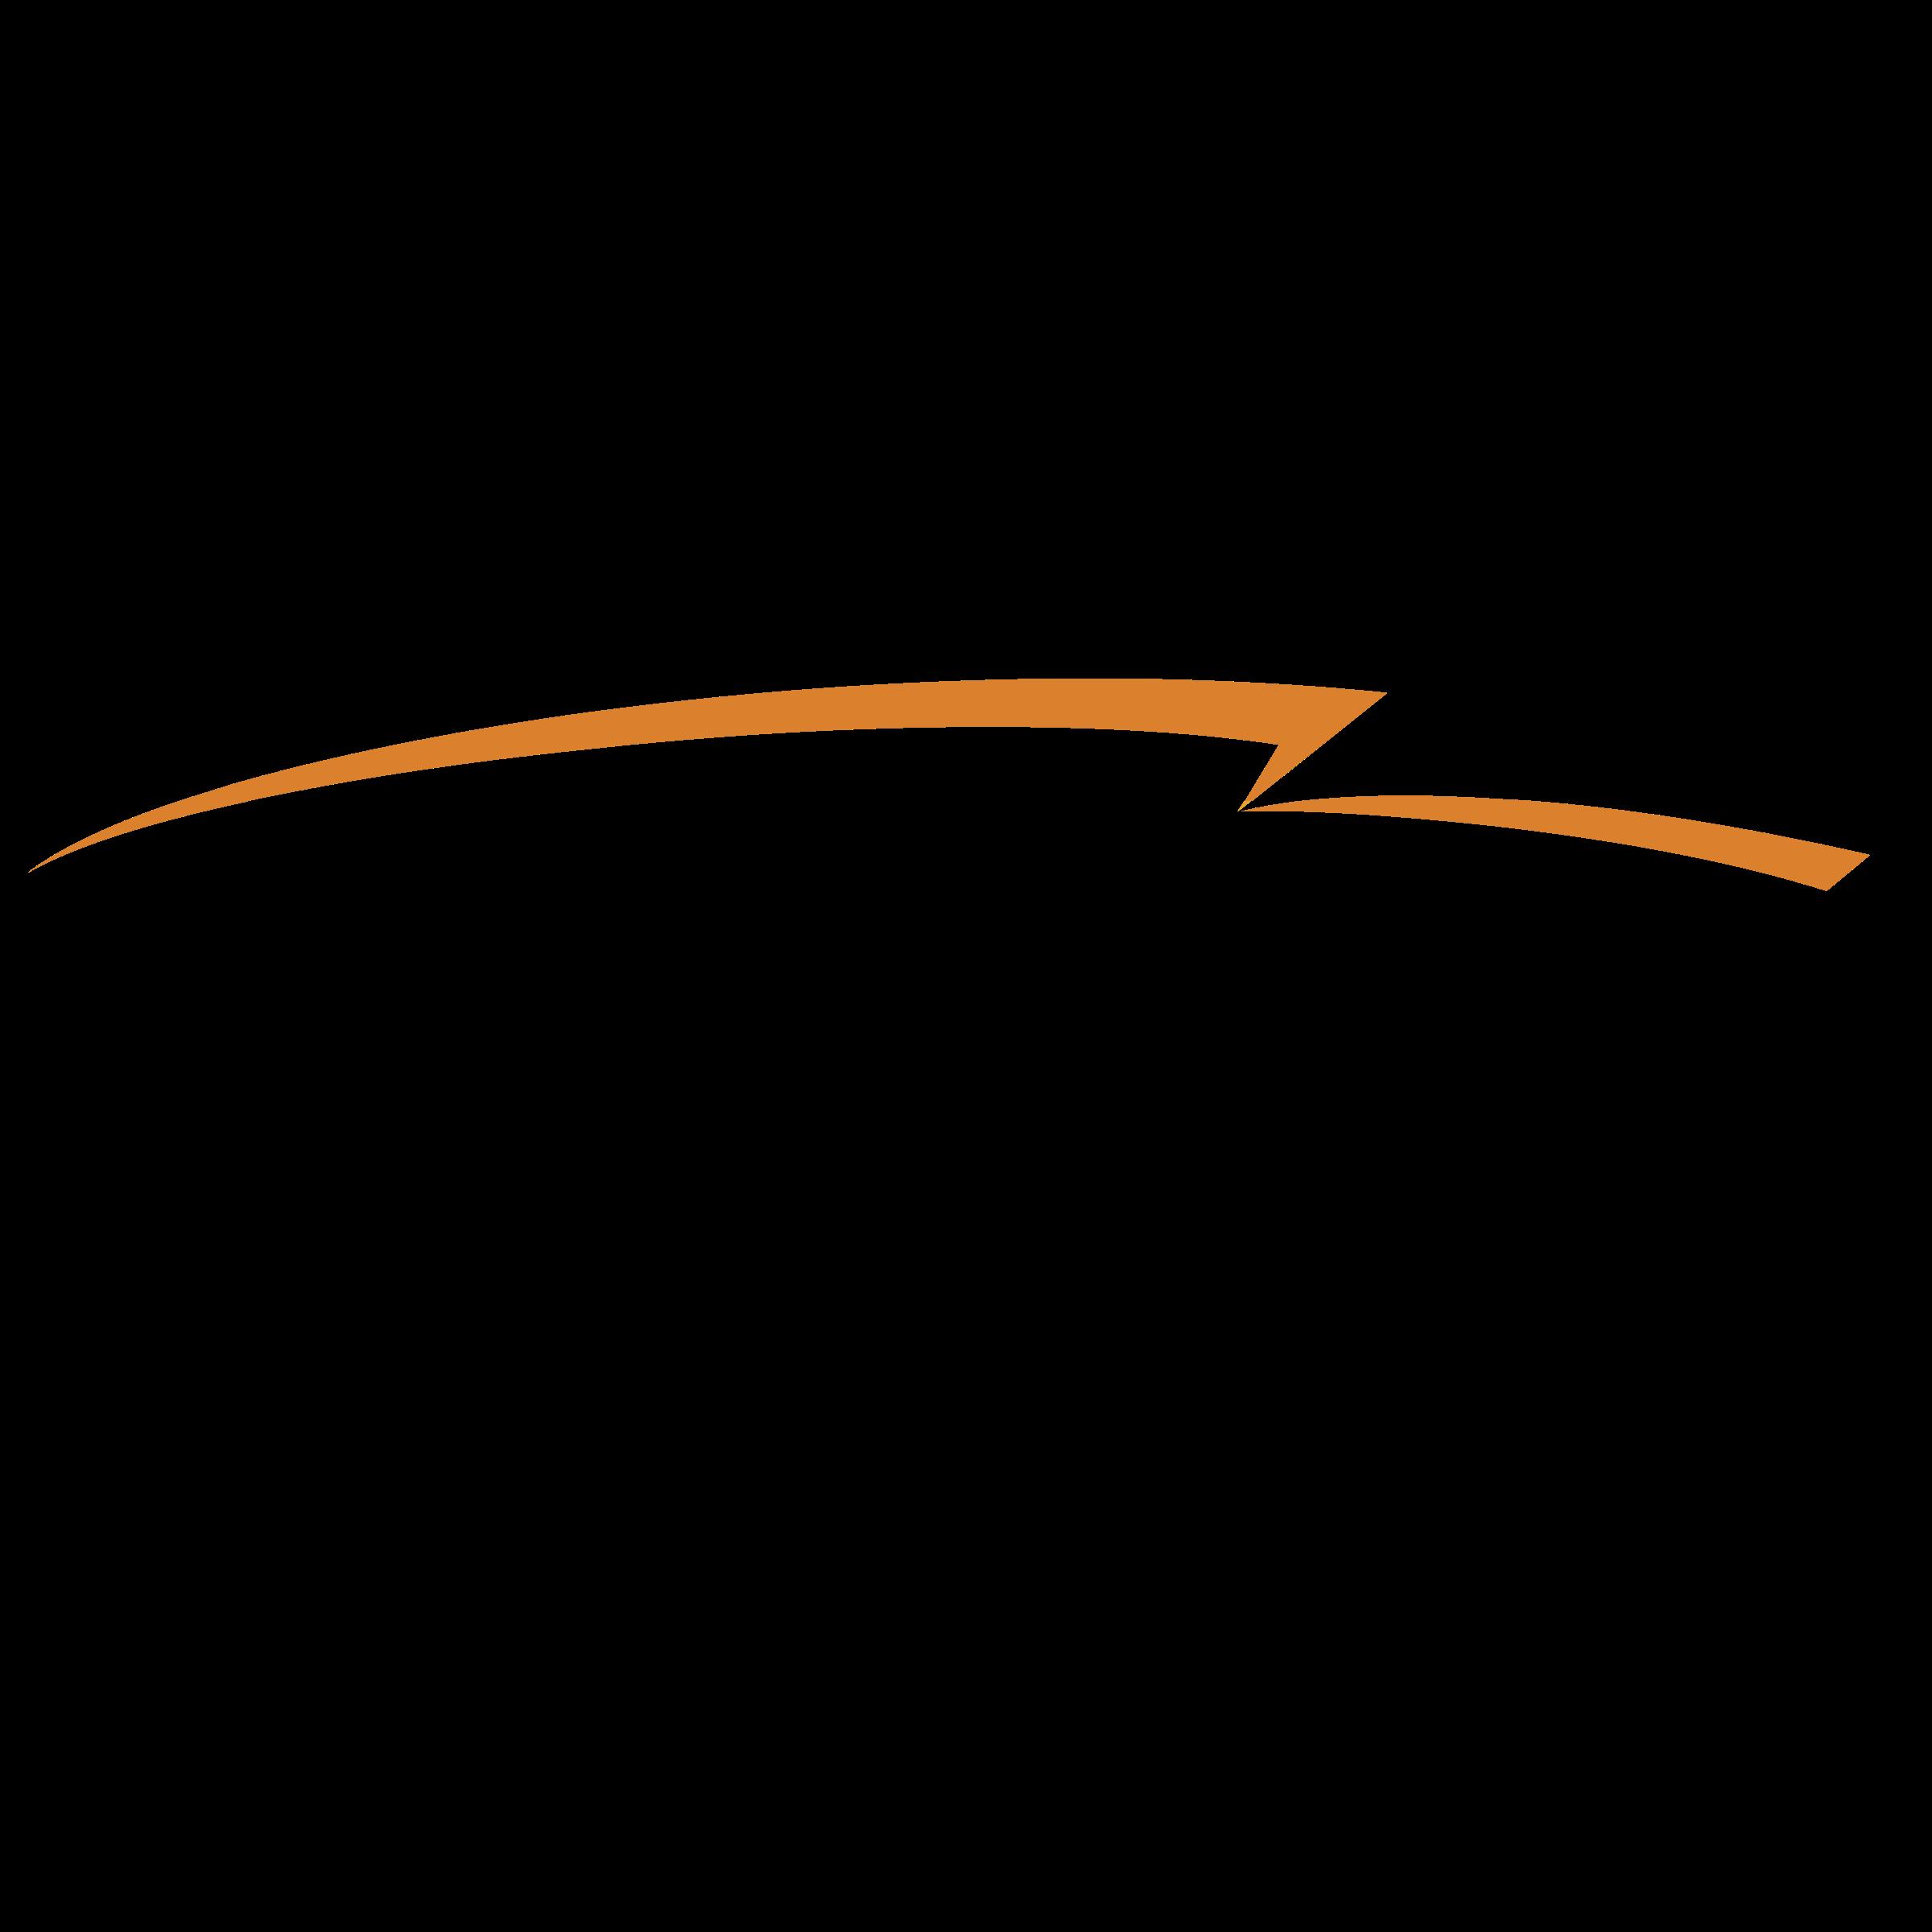 Buzzsaw Logo PNG Transparent & SVG Vector.